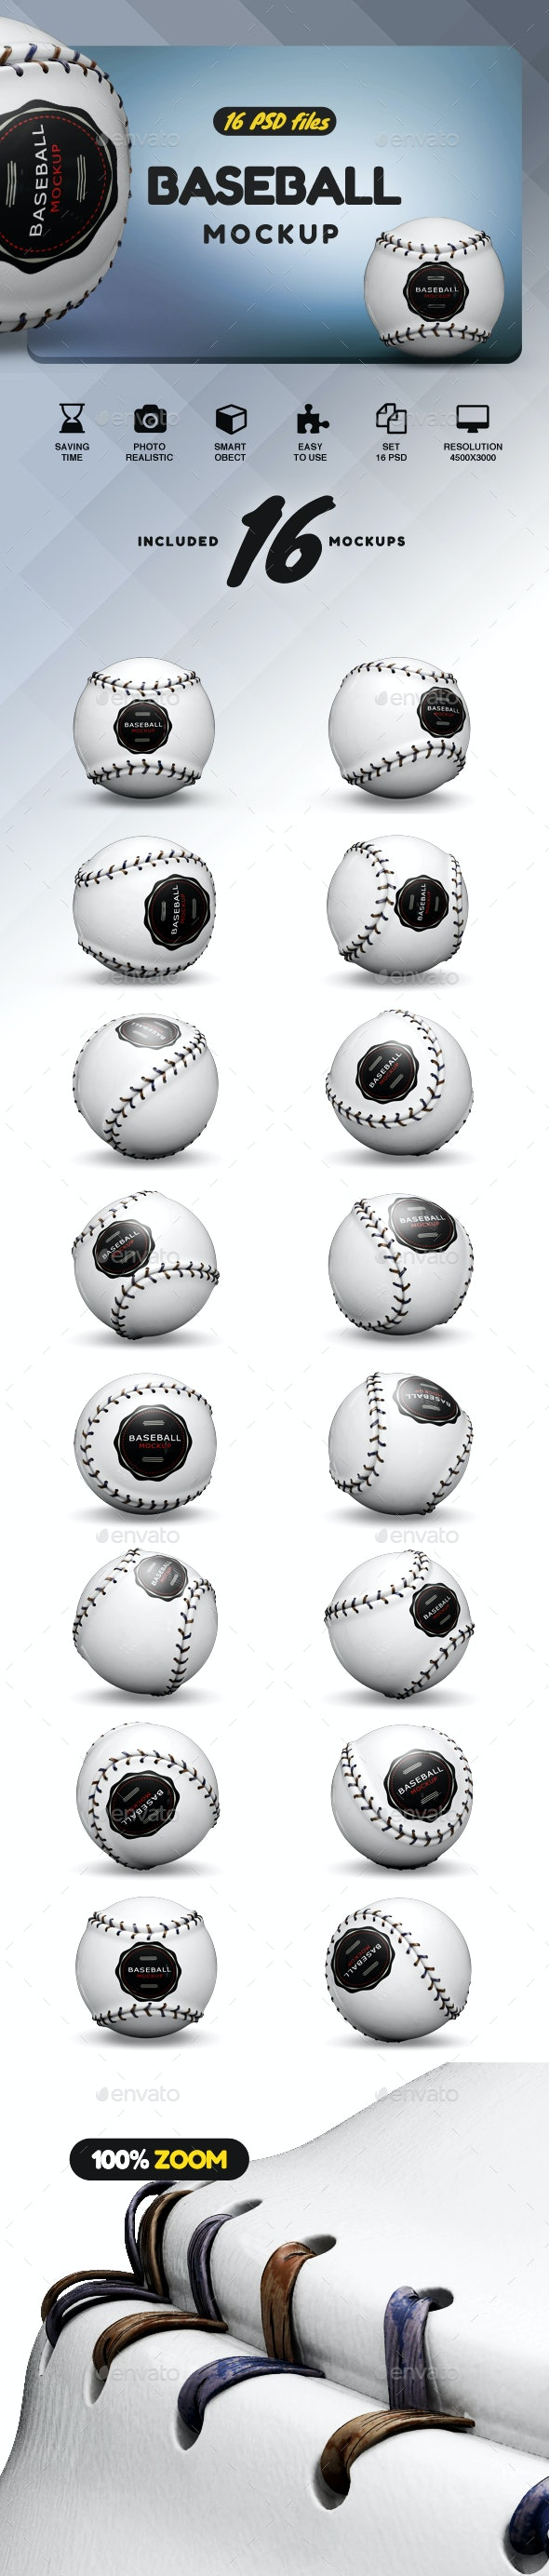 Baseball Mockup - Product Mock-Ups Graphics